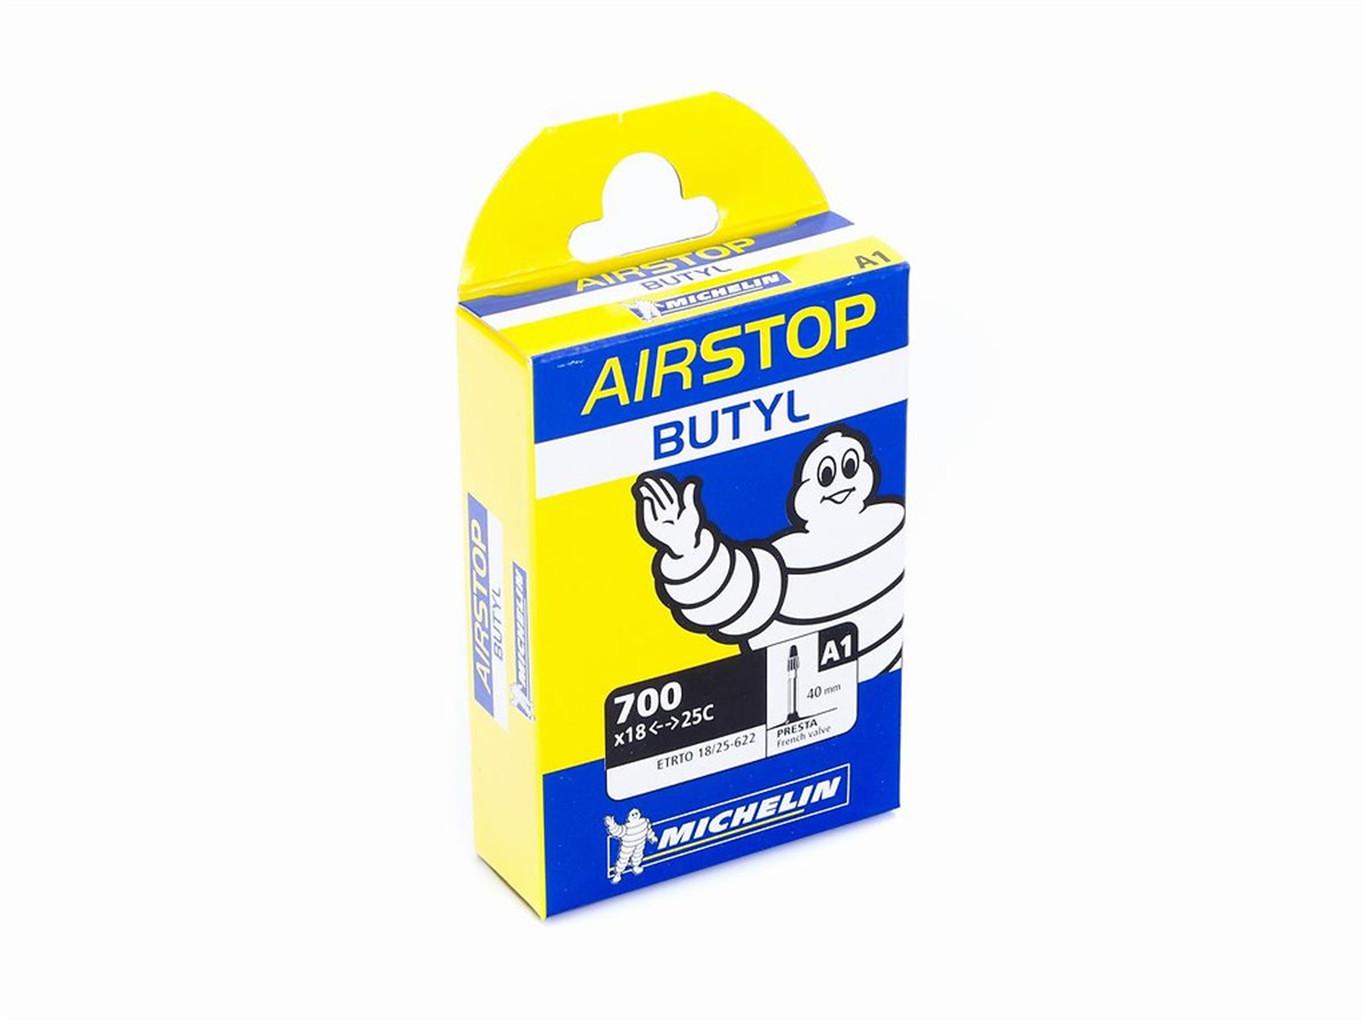 Accent MICHELIN A1 Airstop / Rozmiar koła: 28